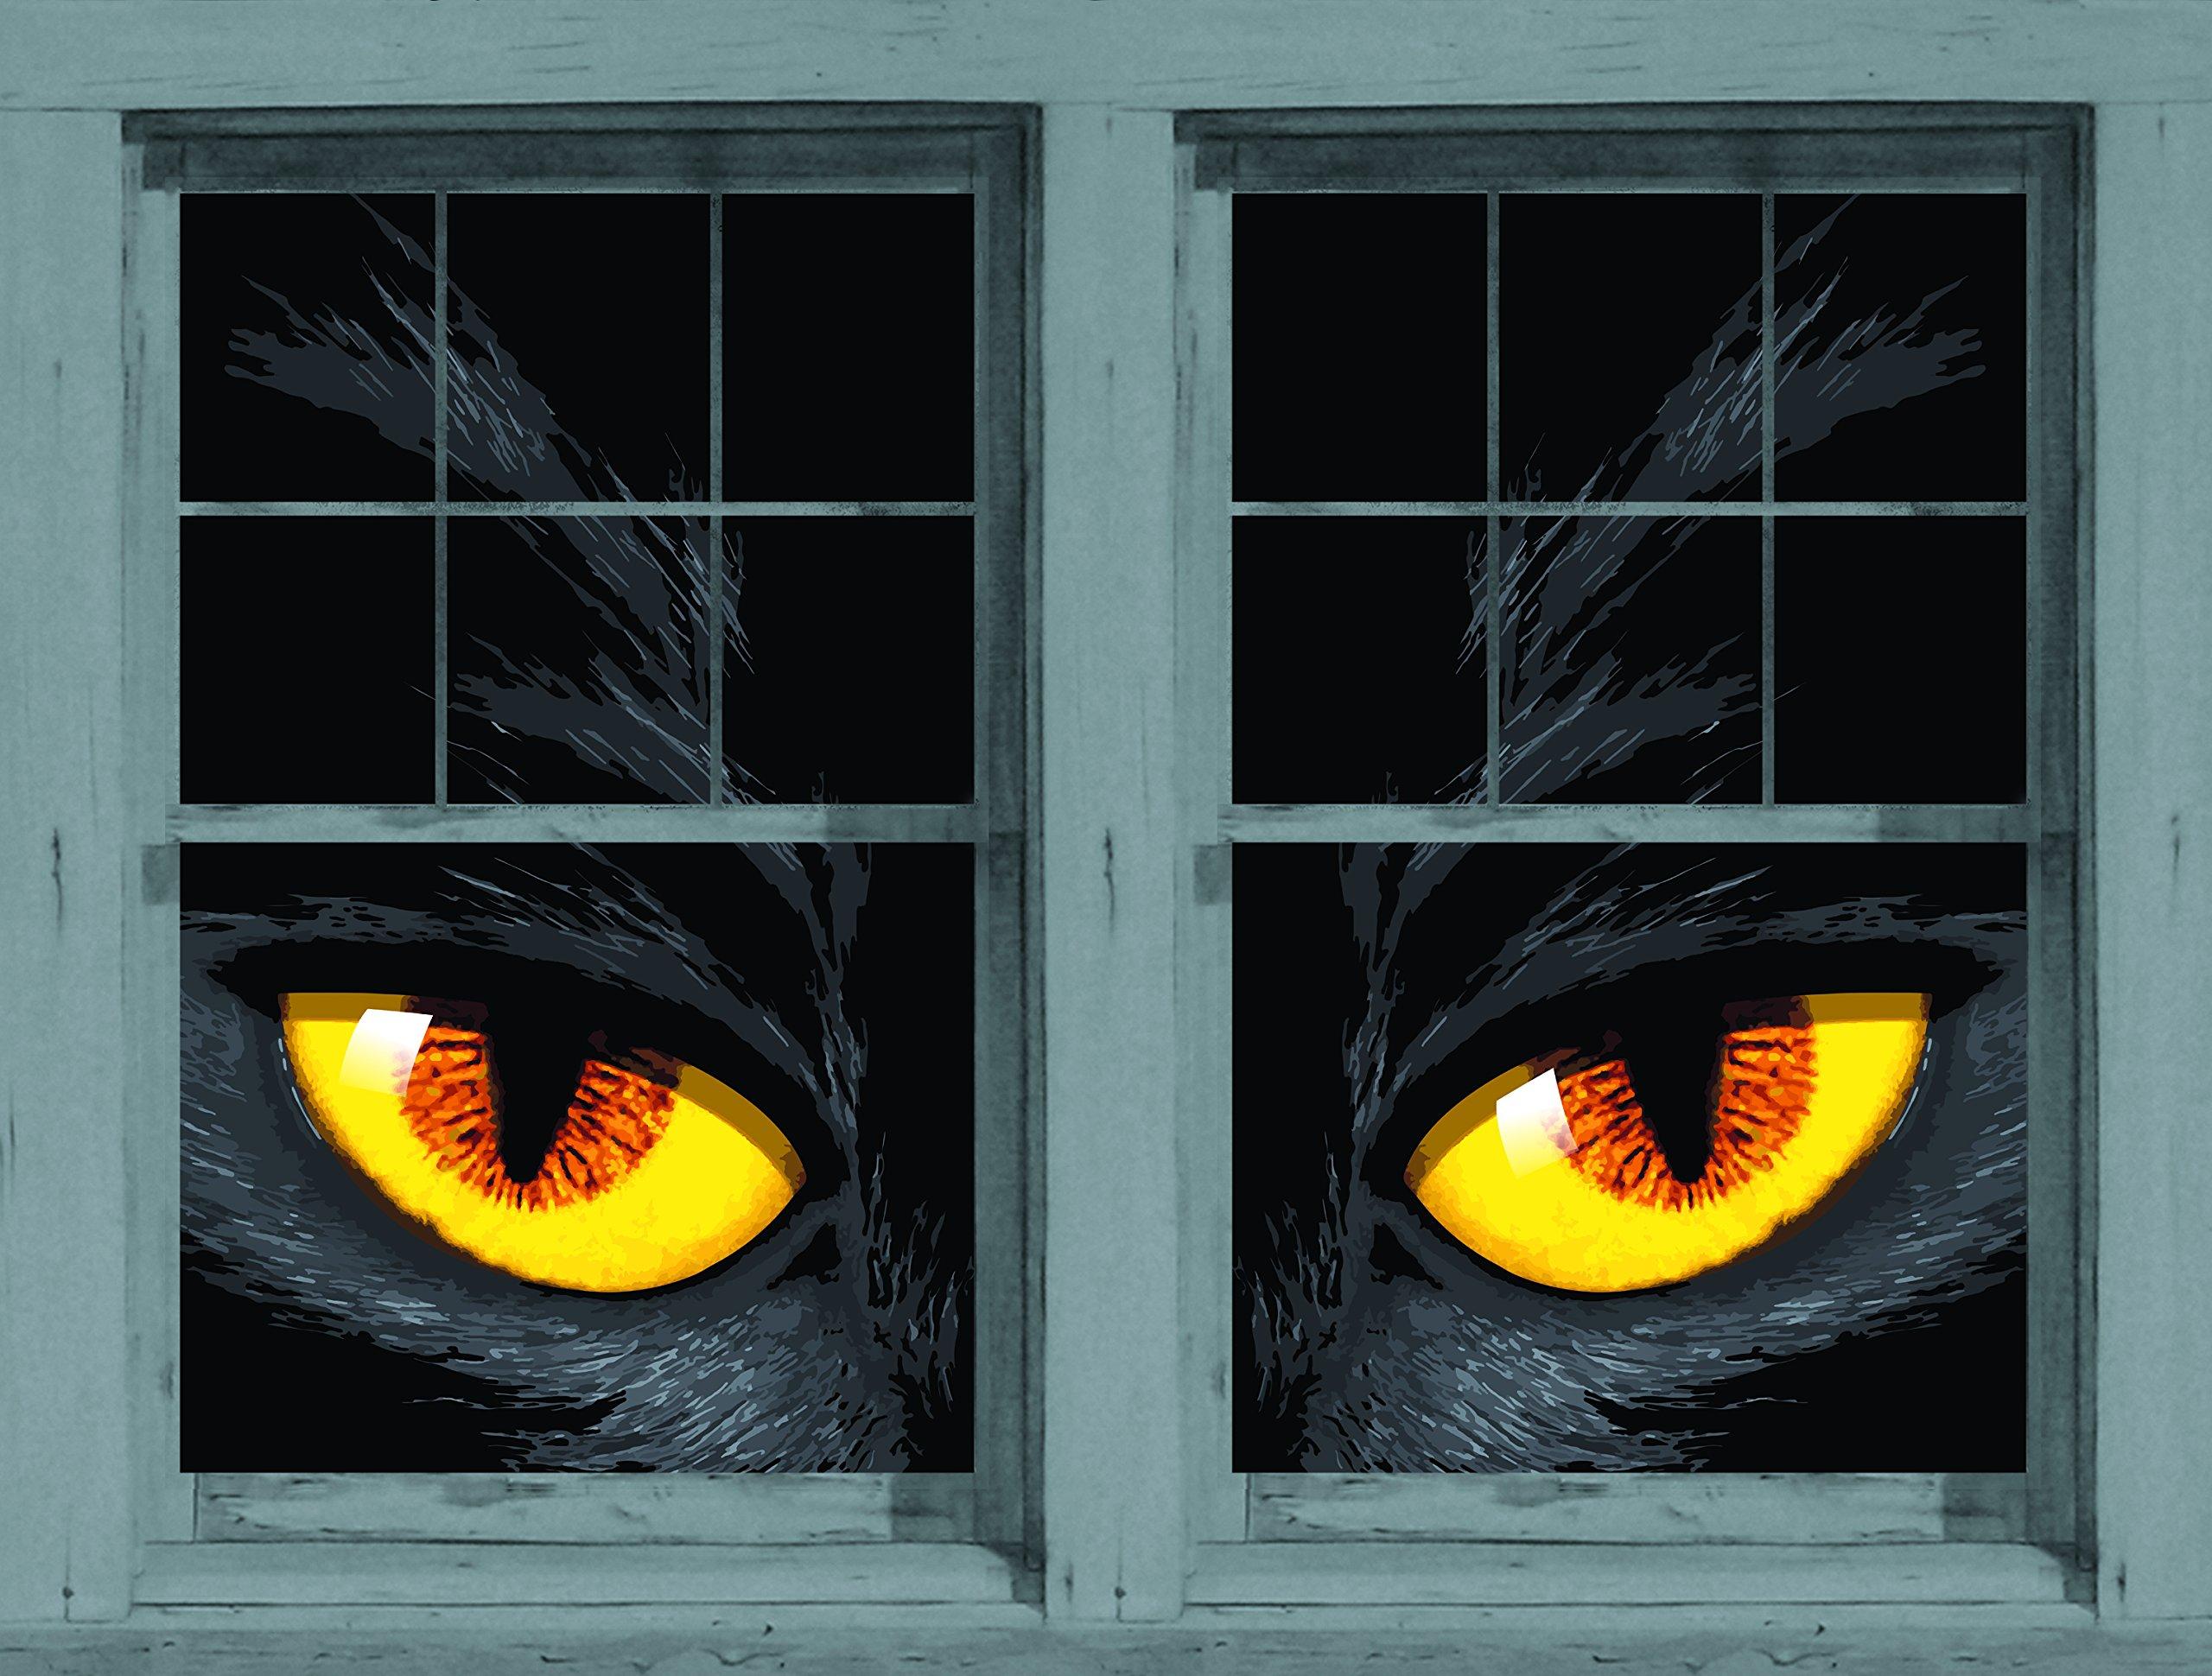 WOWindow Posters Scary Jack Halloween Window Decoration (2